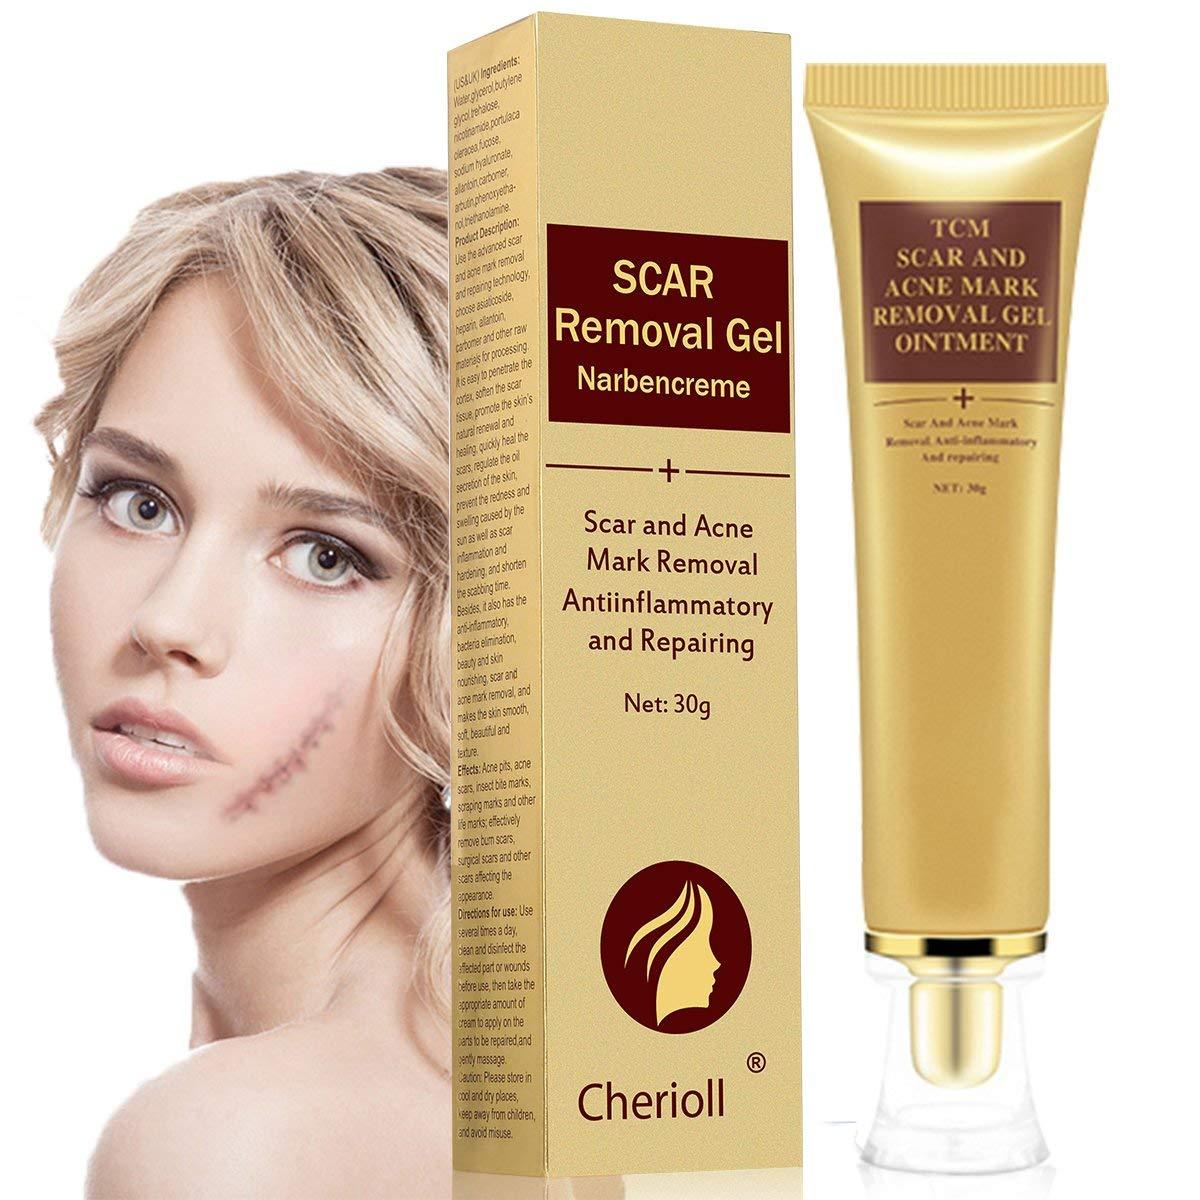 Scar Cream, Acne Scar Removal Cream, Face Skin Repair Cream, Acne Spots Treatment, Scar Gel for Stretch Marks Relief and Burns Repair (30ml)